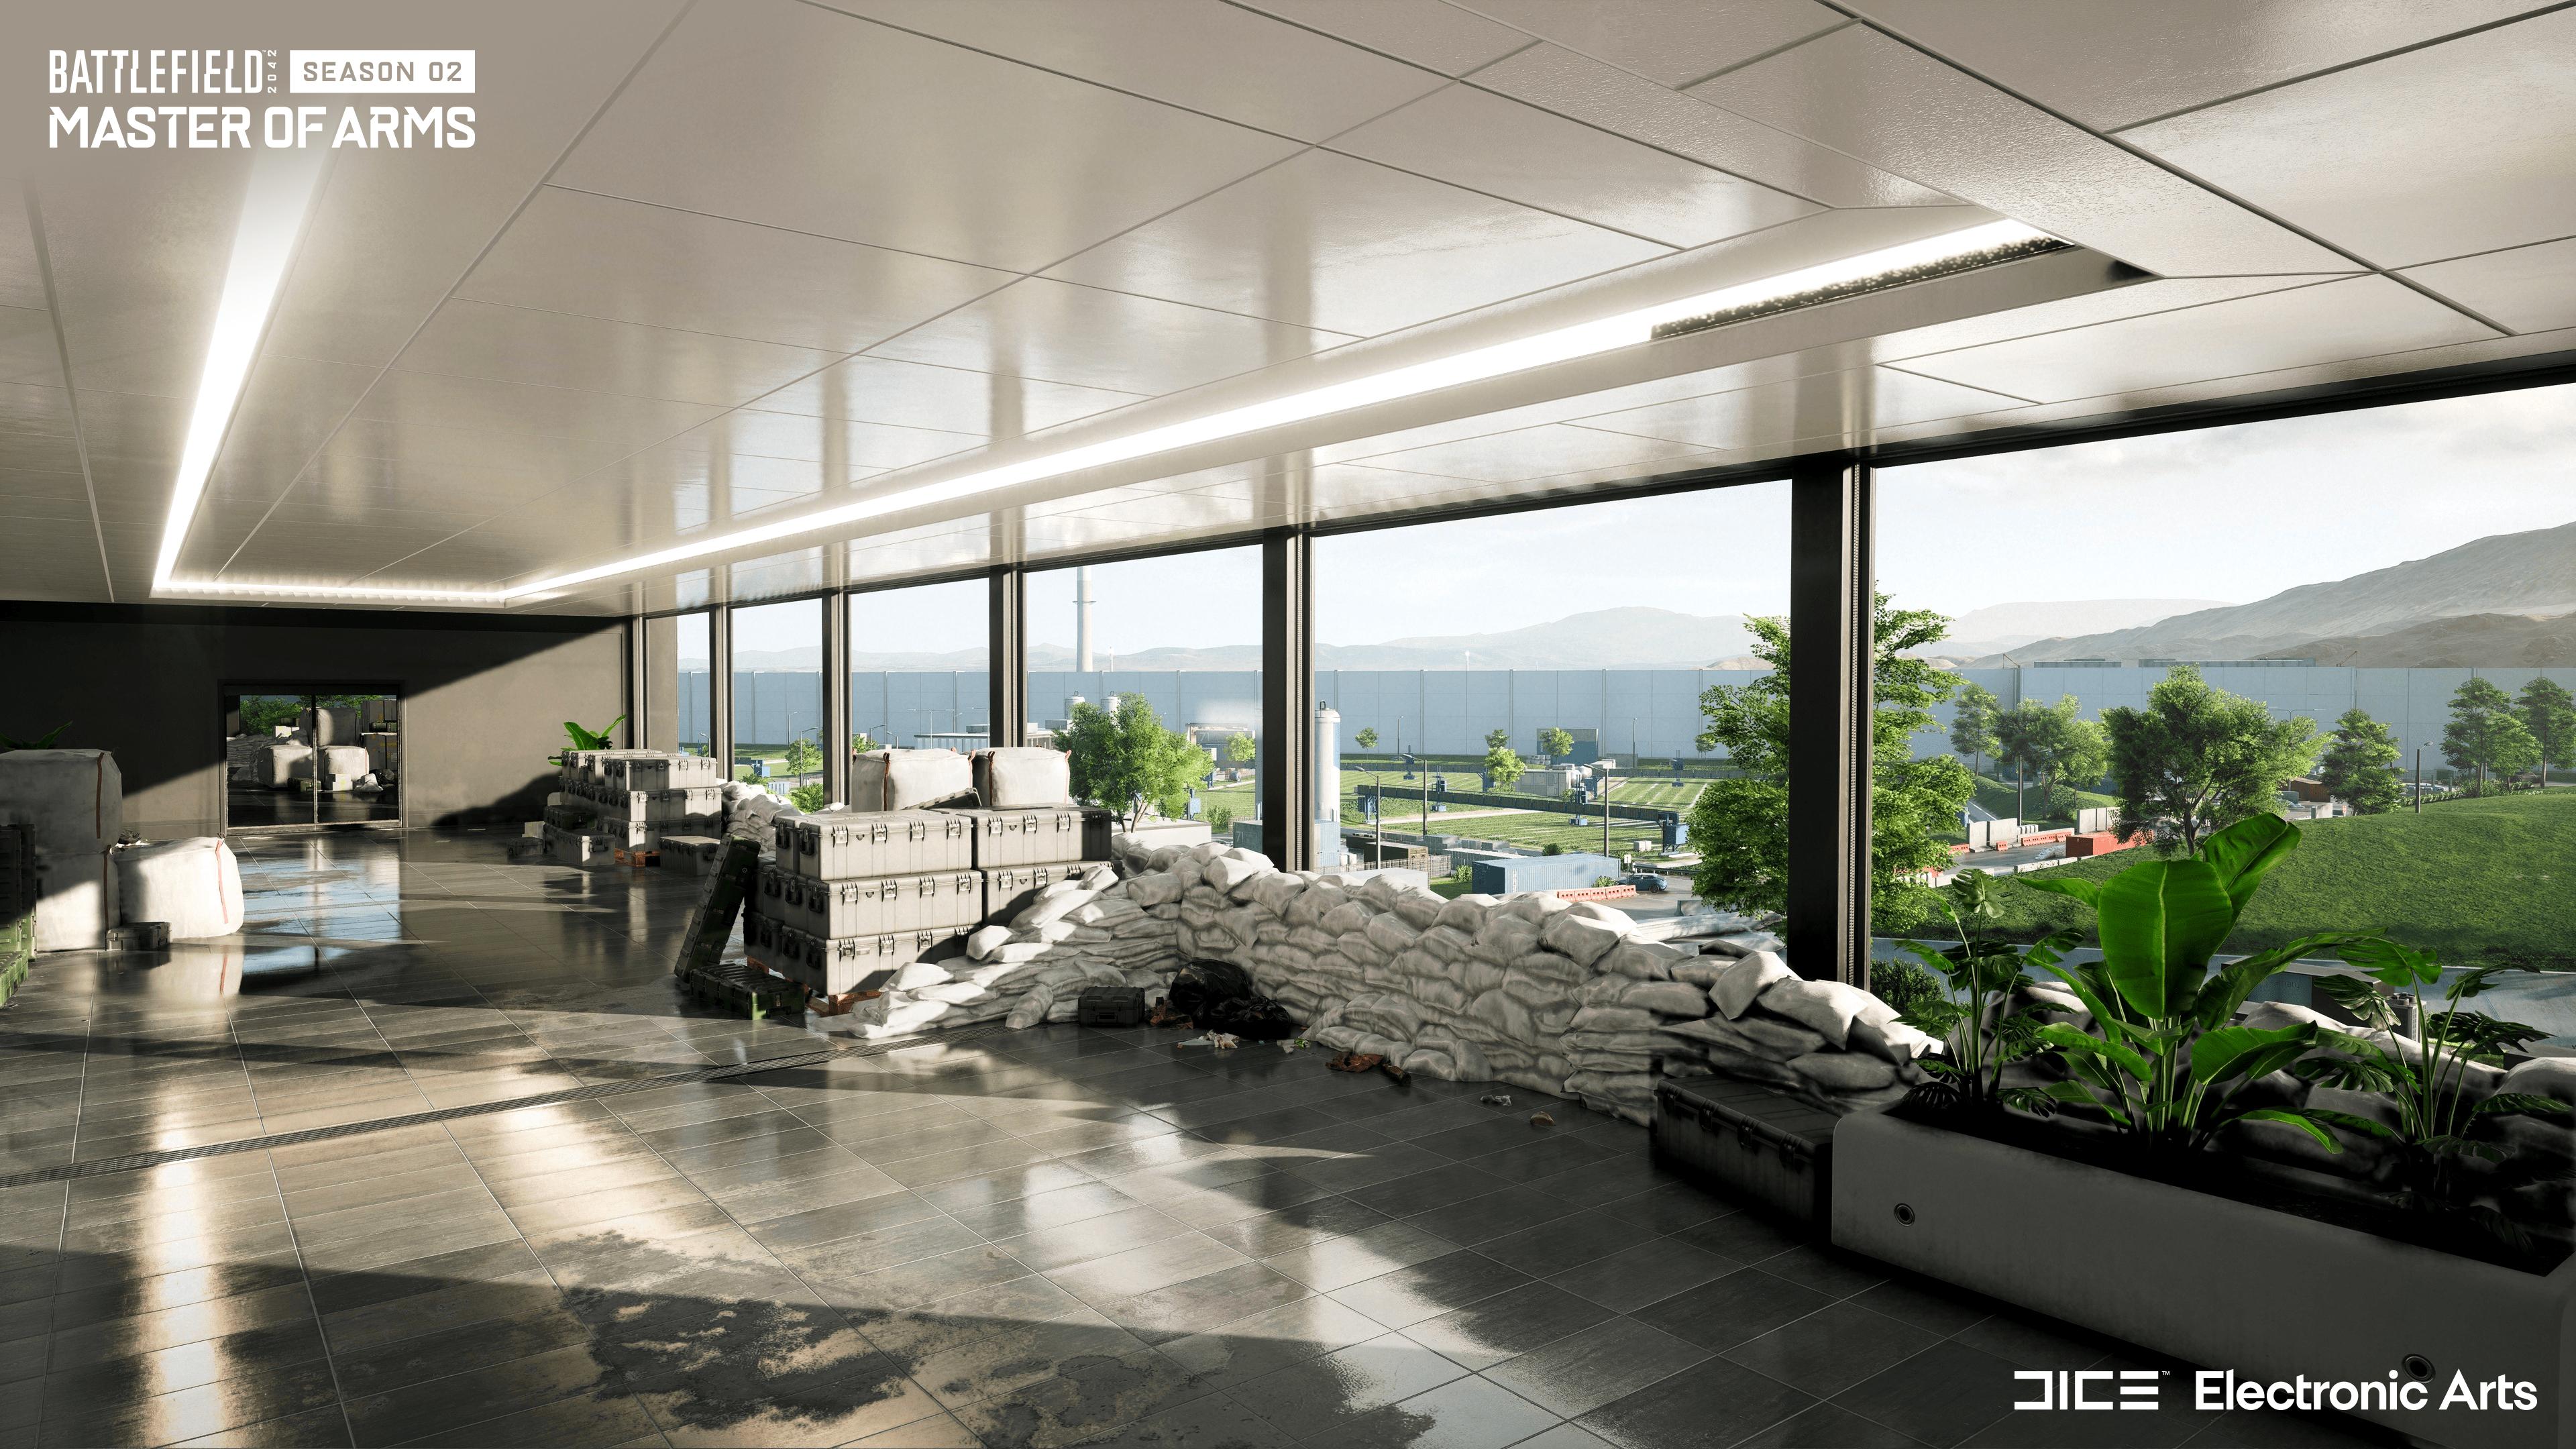 bf-2042-full-res-map-vista-renewal.jpg